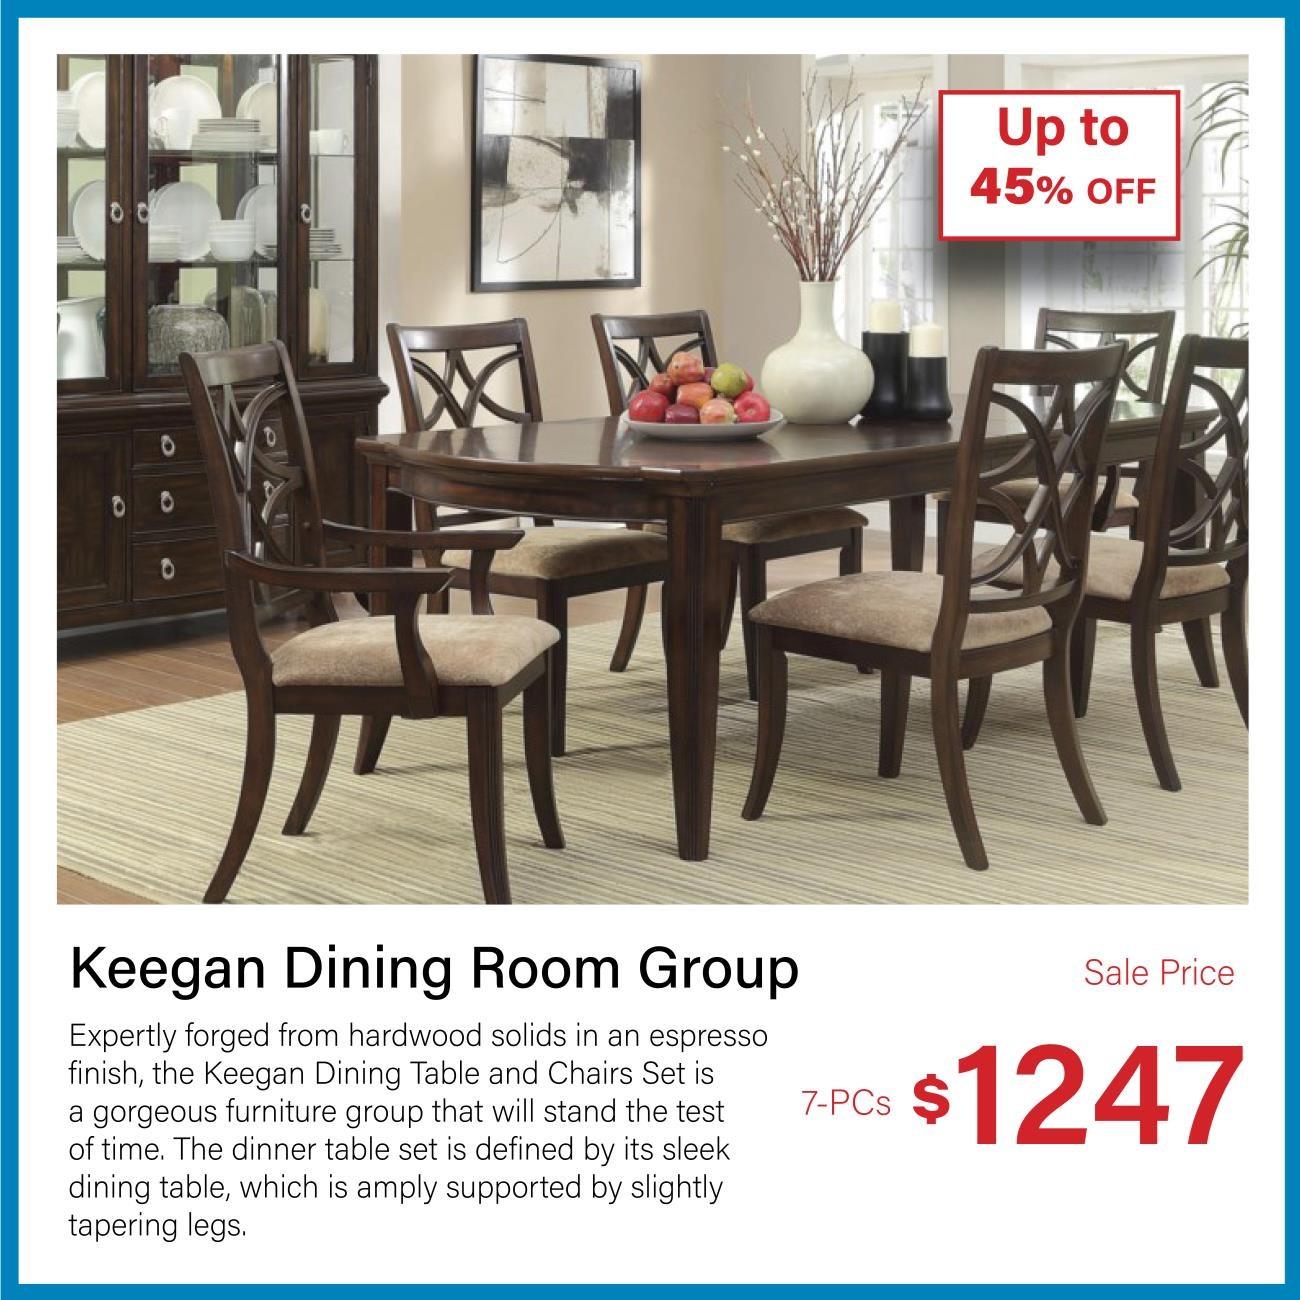 Keegan espresso 7-pc dining set